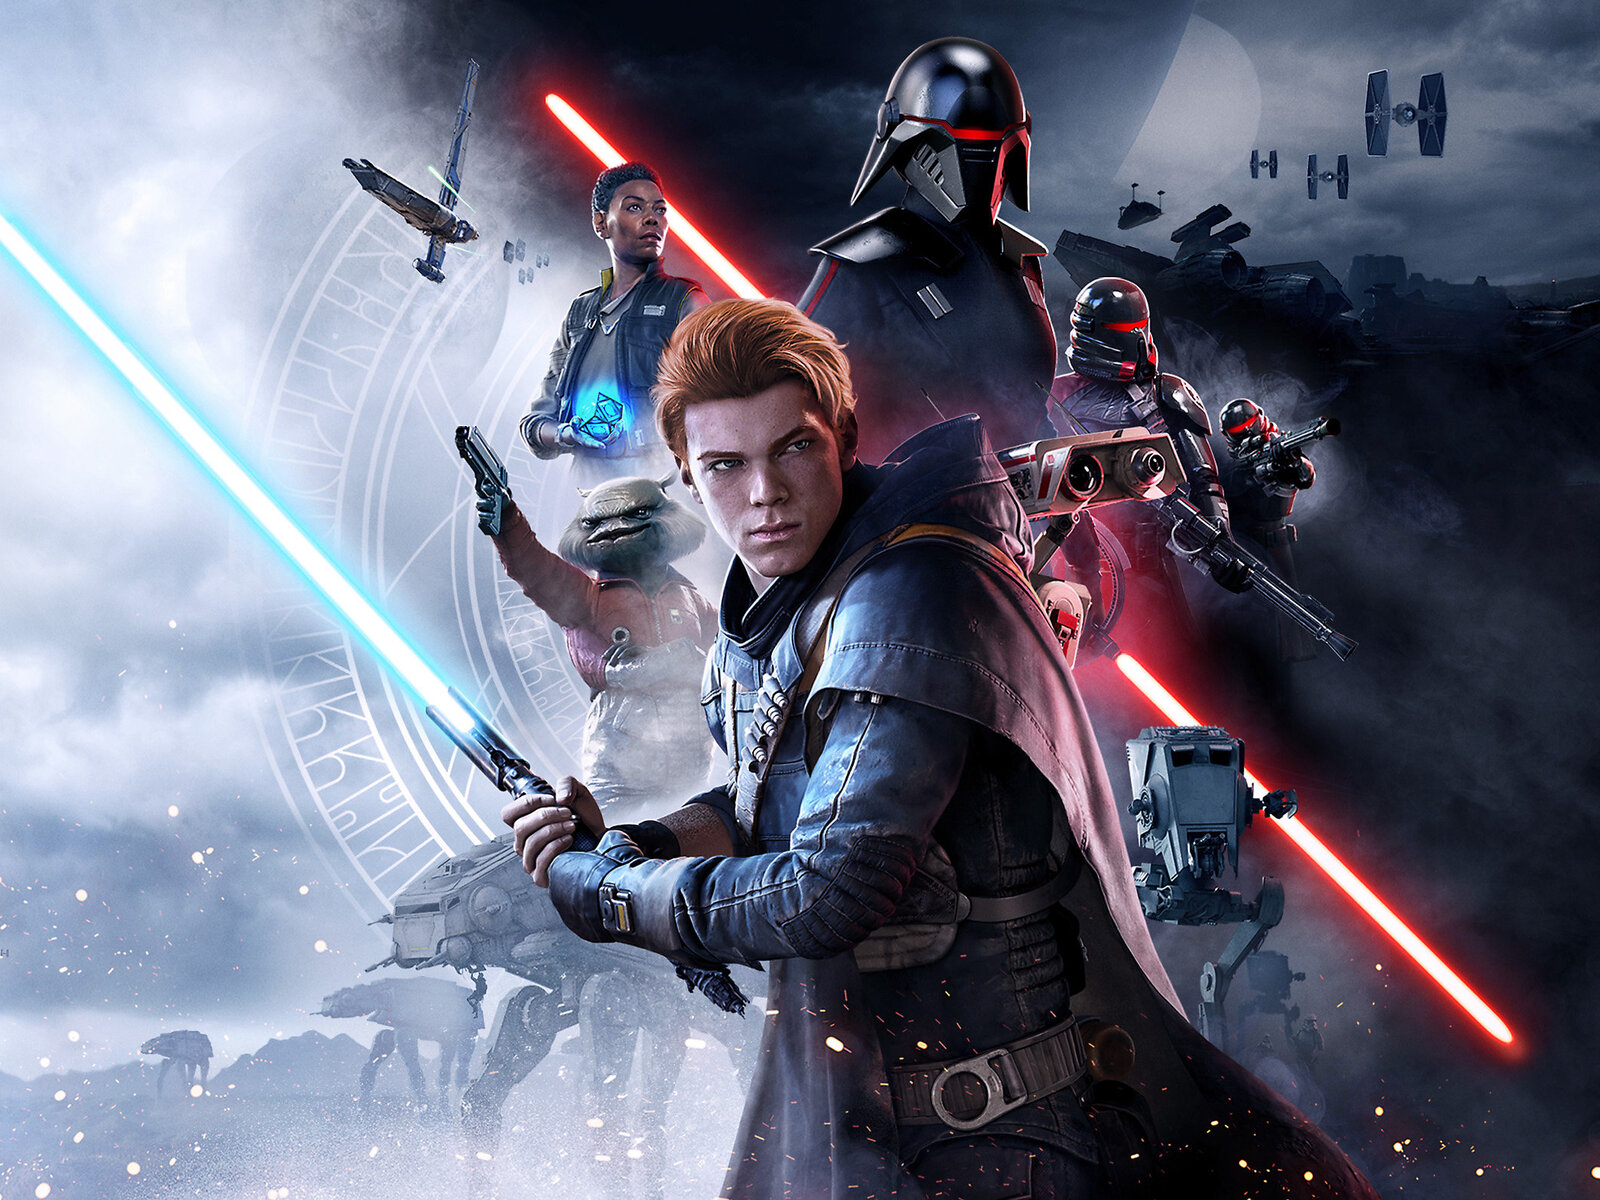 star-wars-jedi-fallen-order-4k-new-ok.jpg